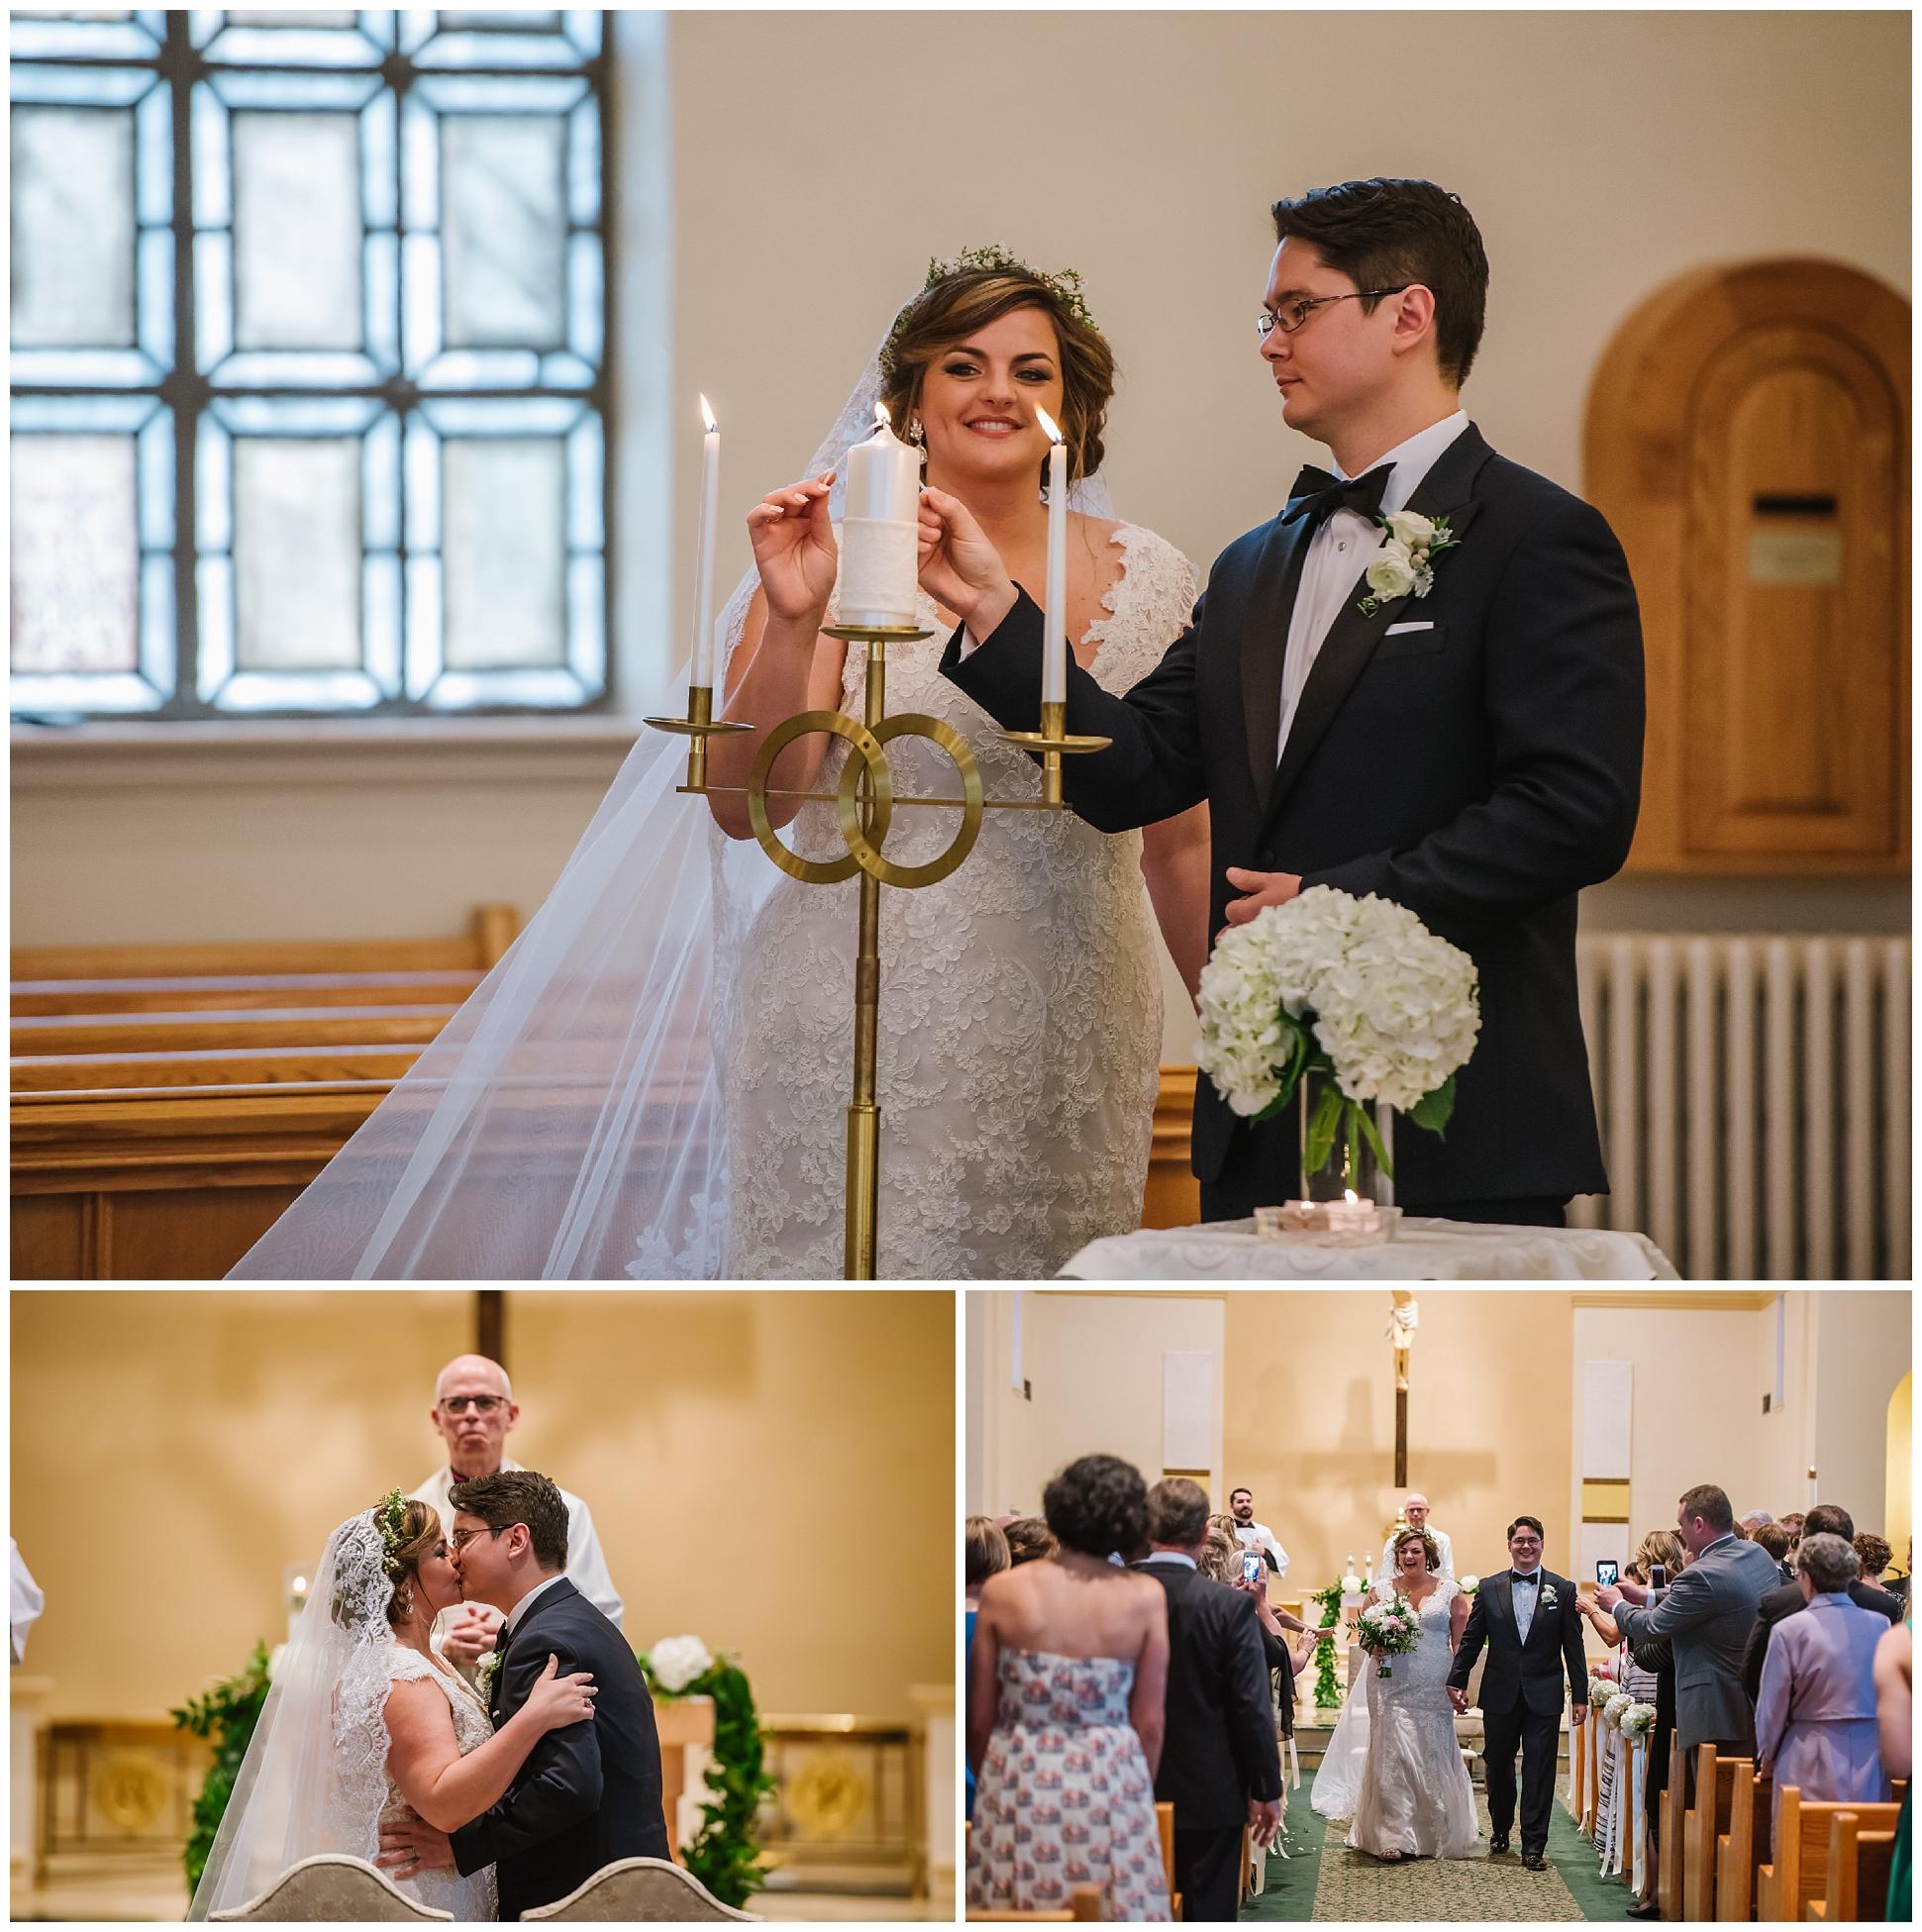 st-pete-wedding-photographer-italian-romance-theme-rustic-flower-crown_0401.jpg